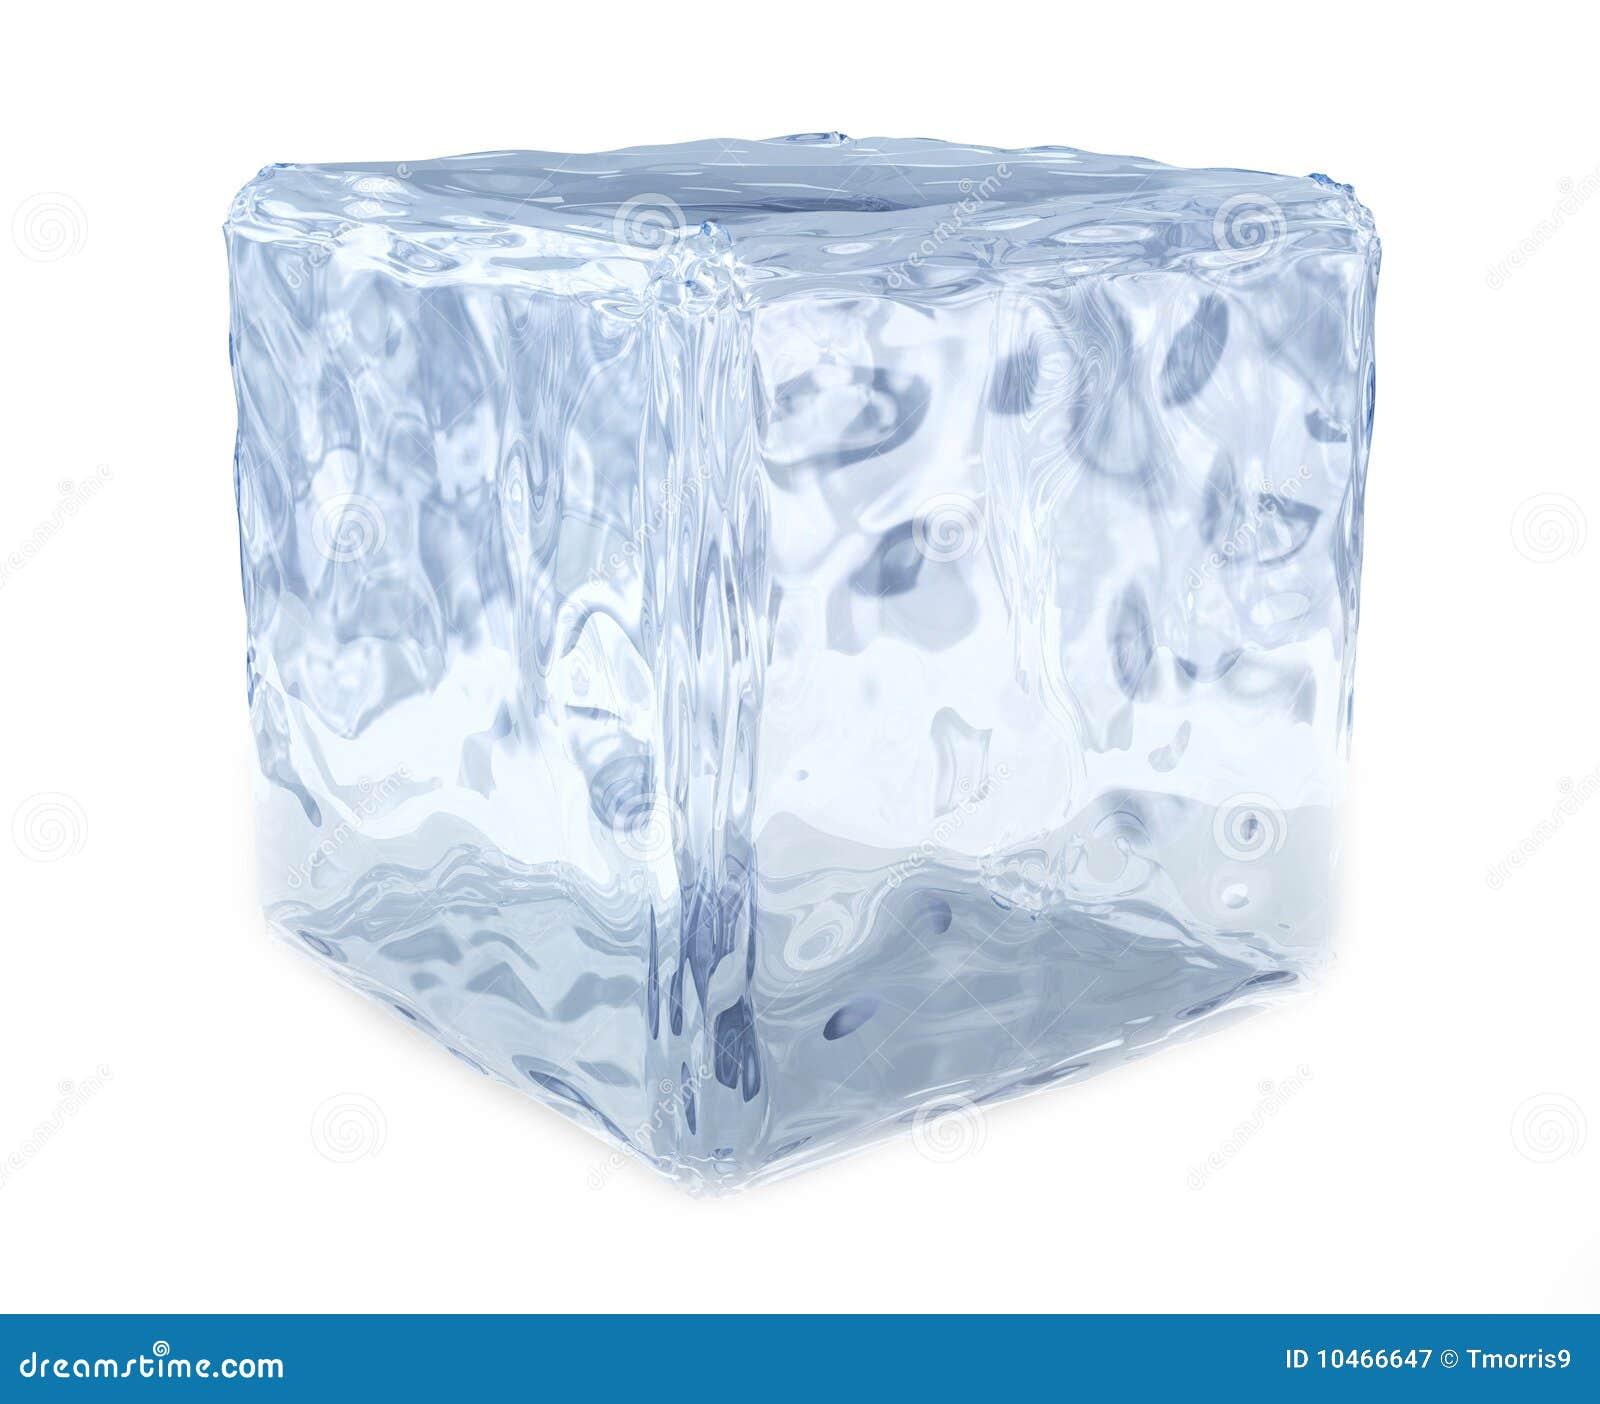 Frozen Ice Cube Block of ice